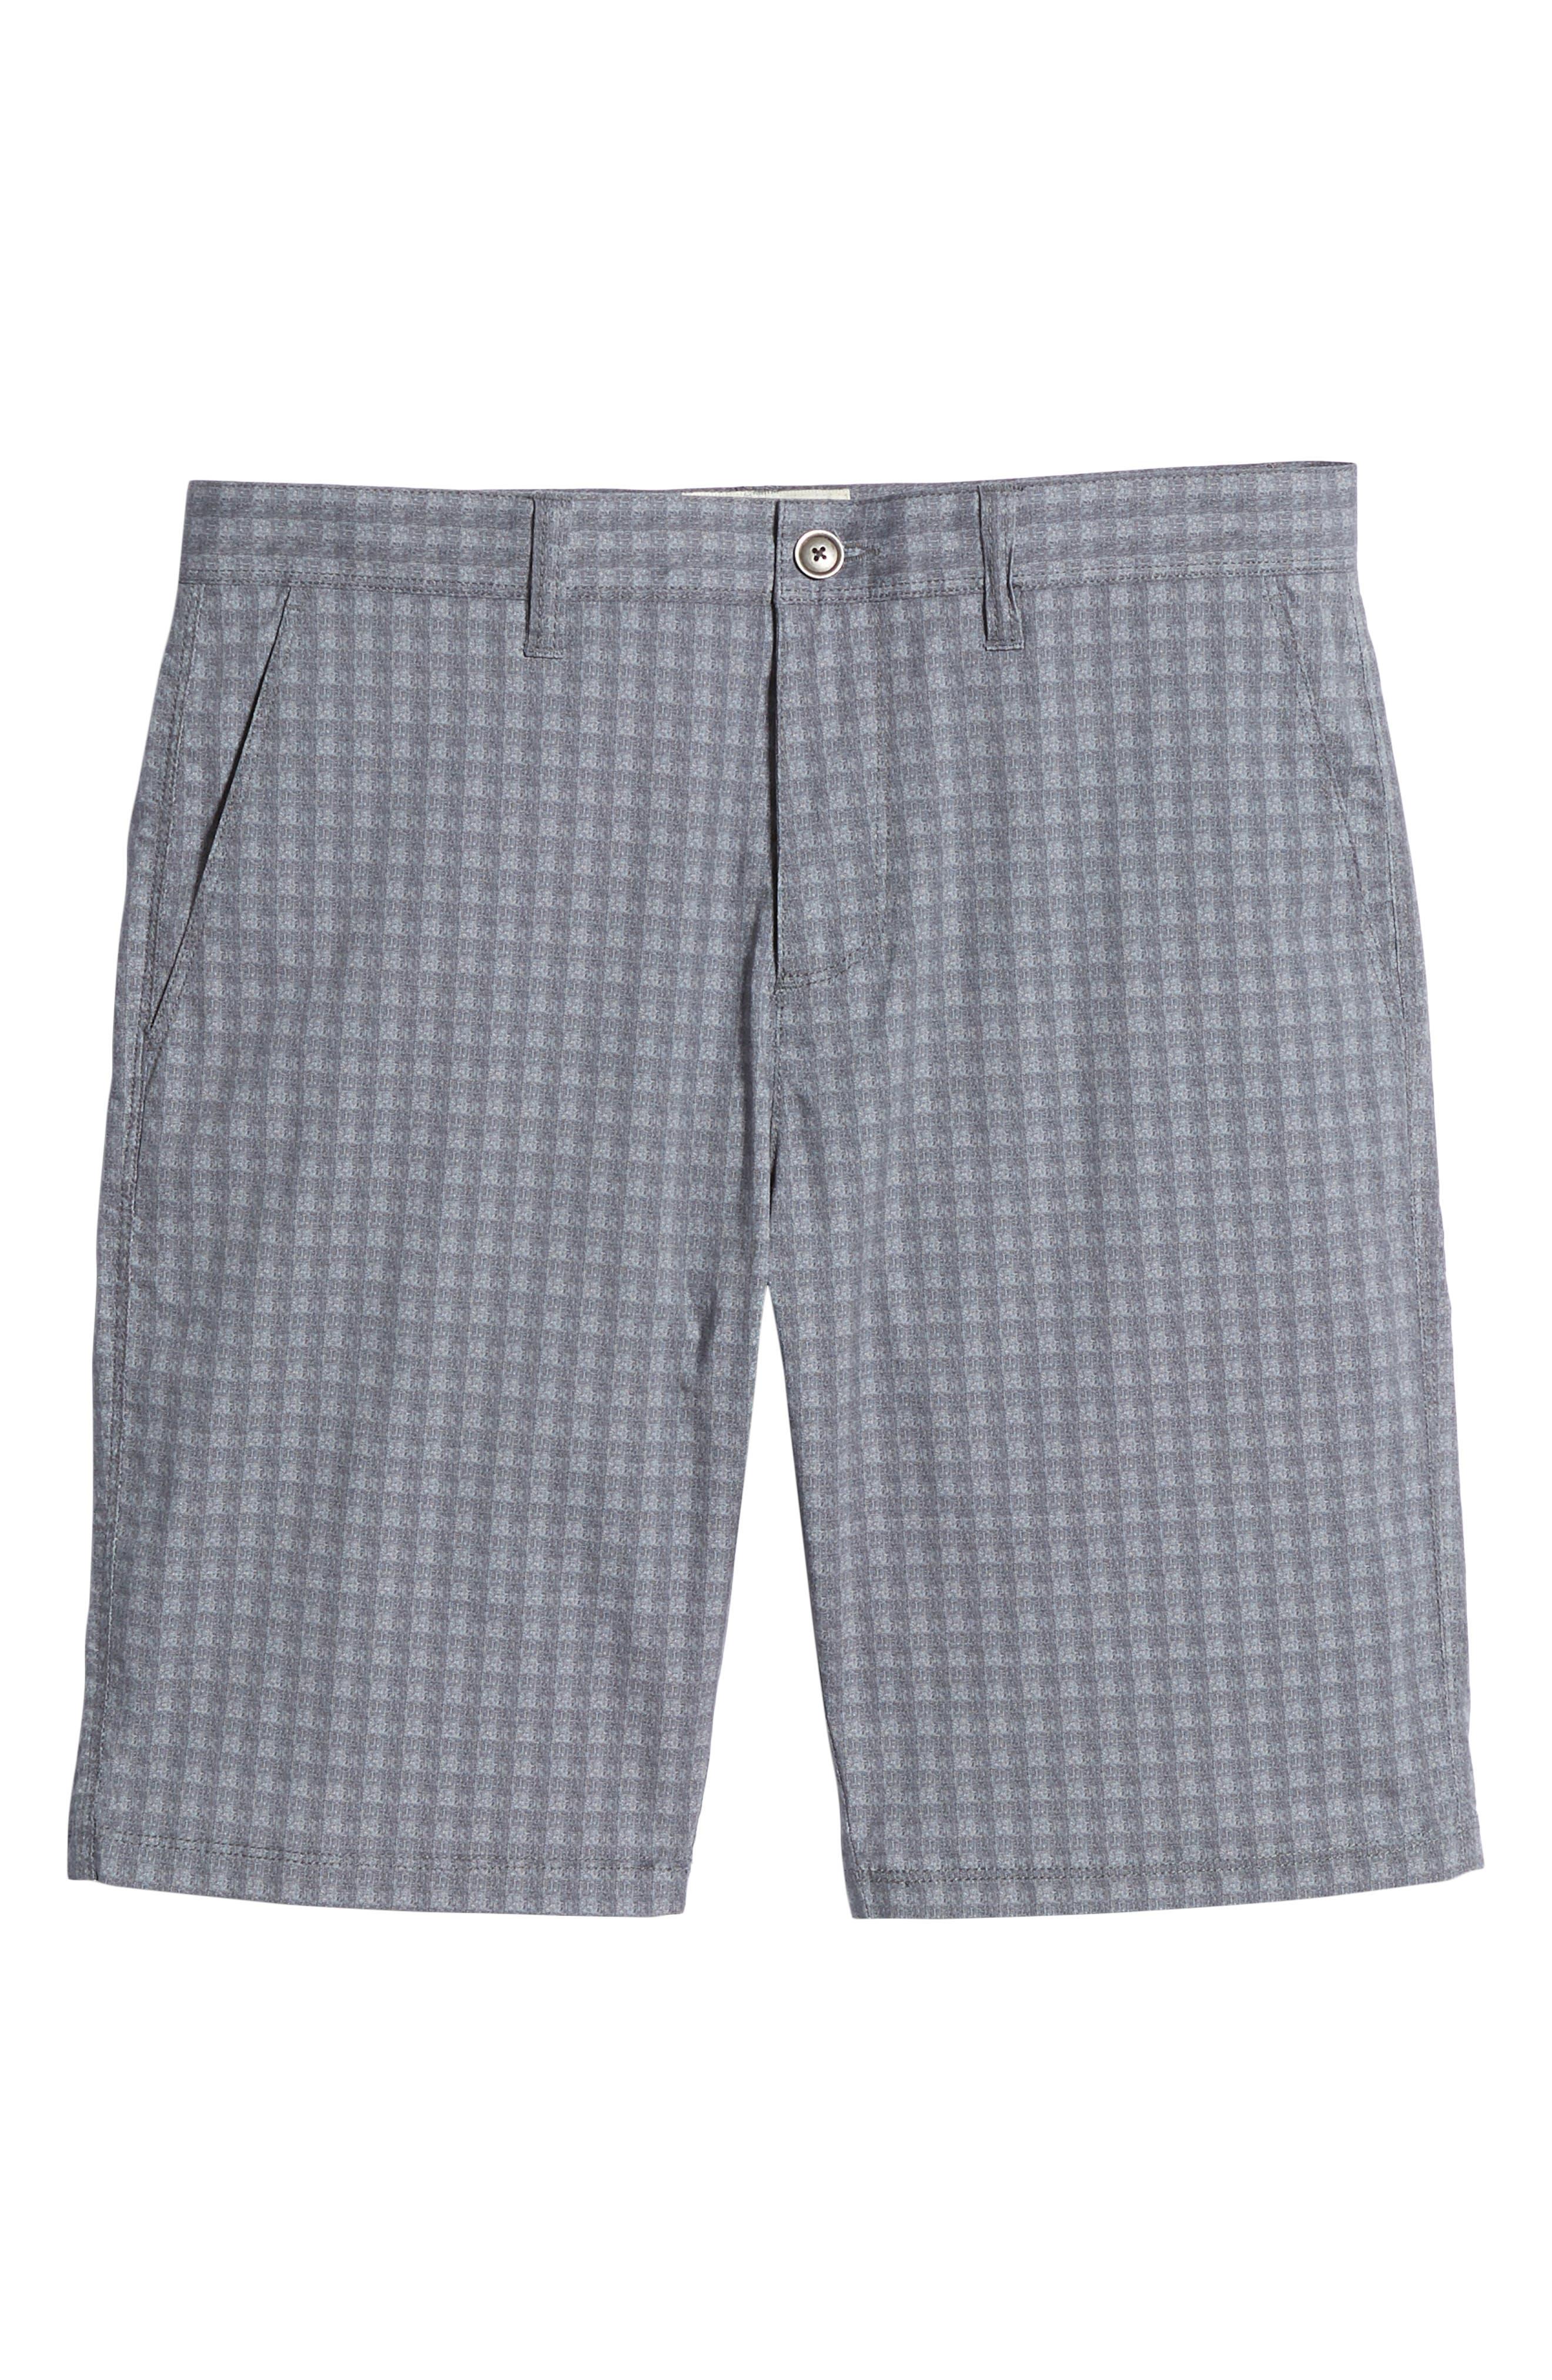 Tristen Check Shorts,                             Alternate thumbnail 6, color,